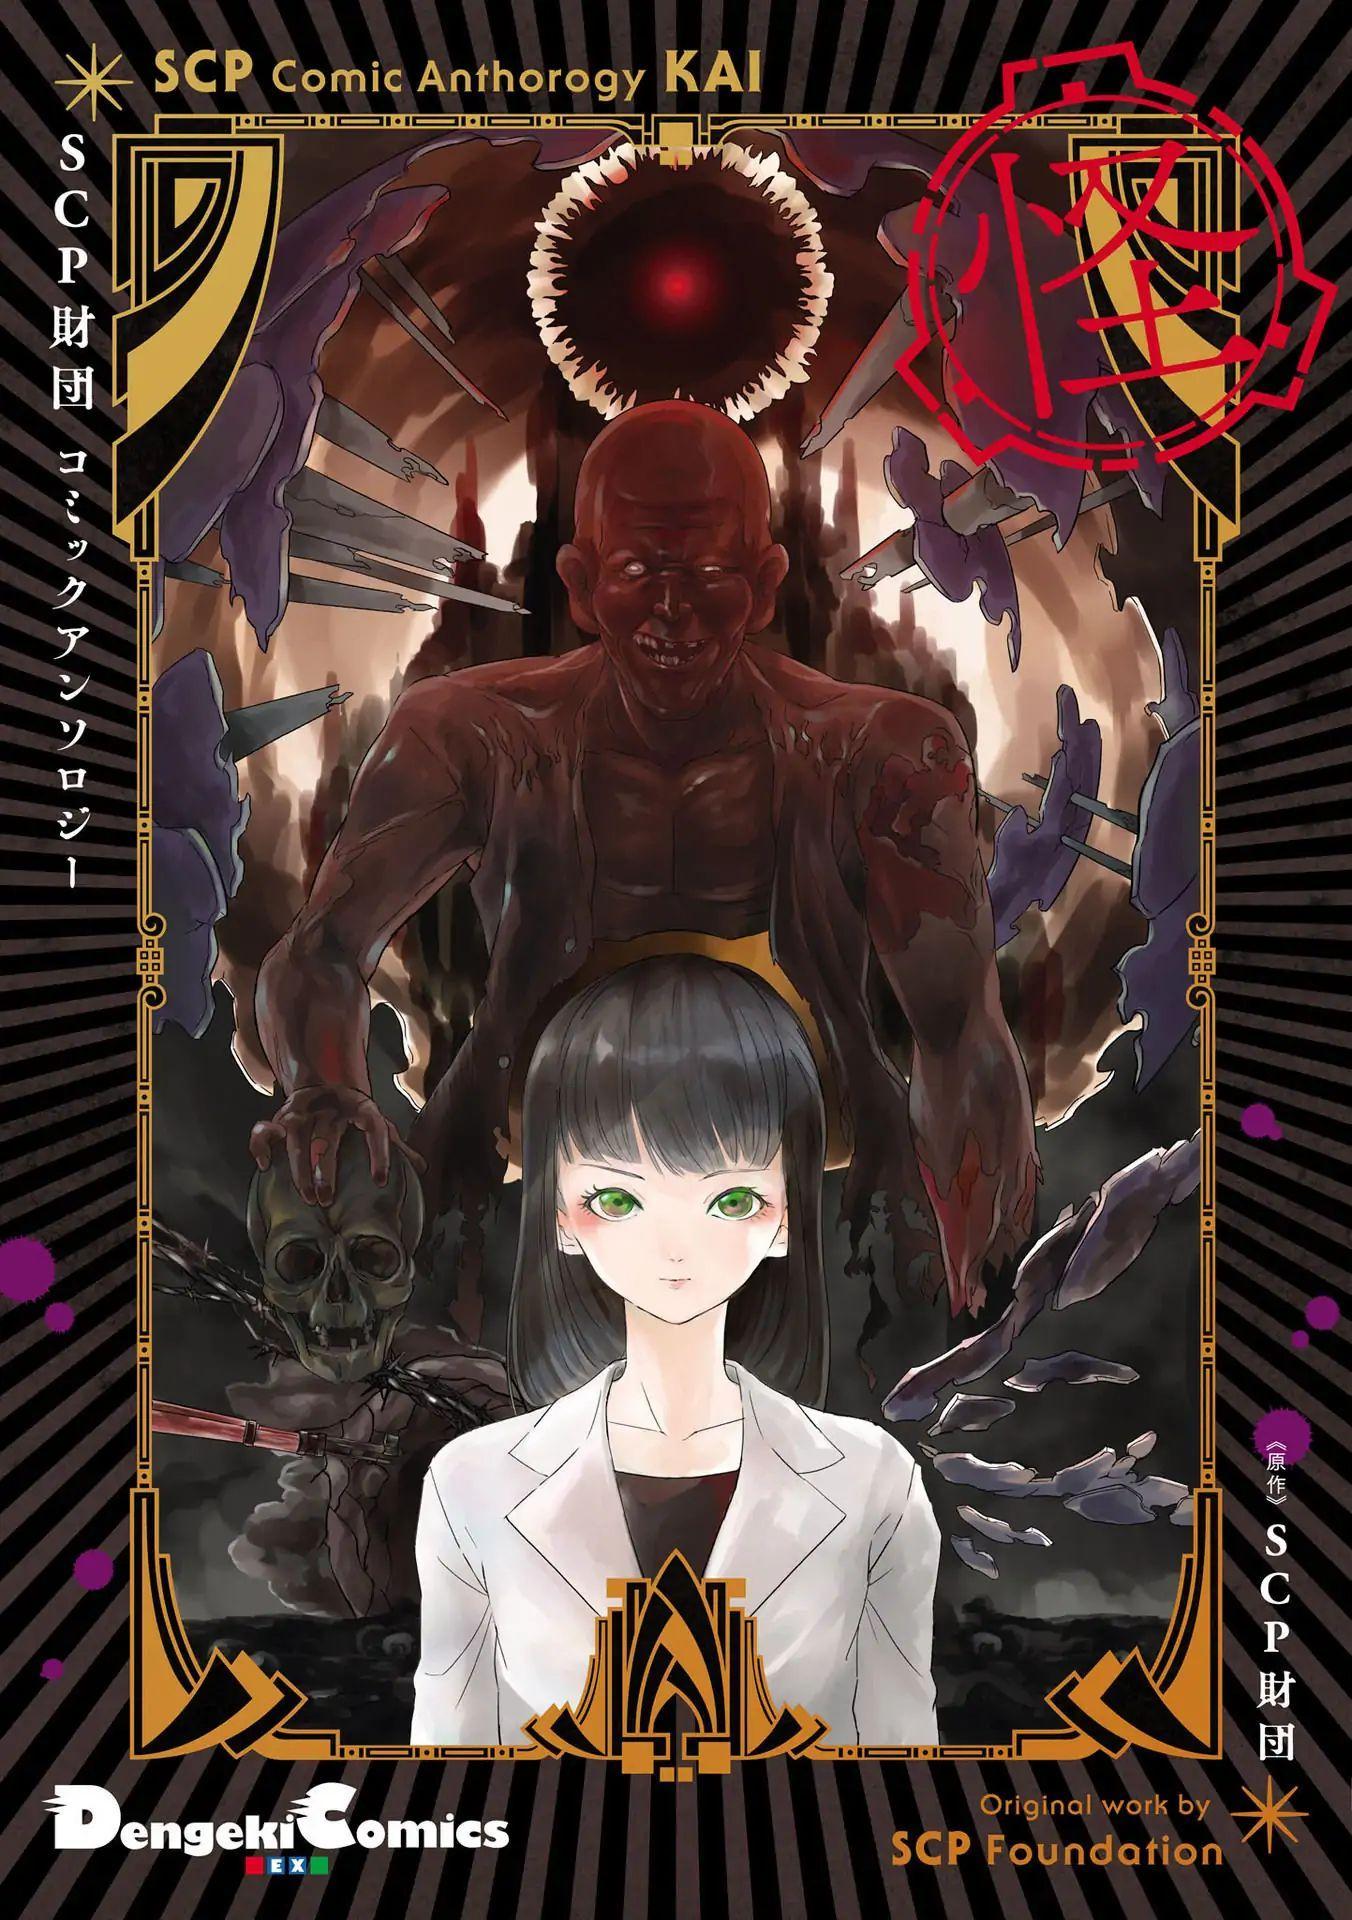 https://nine.mangadogs.com/fr_manga/pic2/42/3562/463696/SCPComicAnthologyKAI1VF_0_356.jpg Page 1